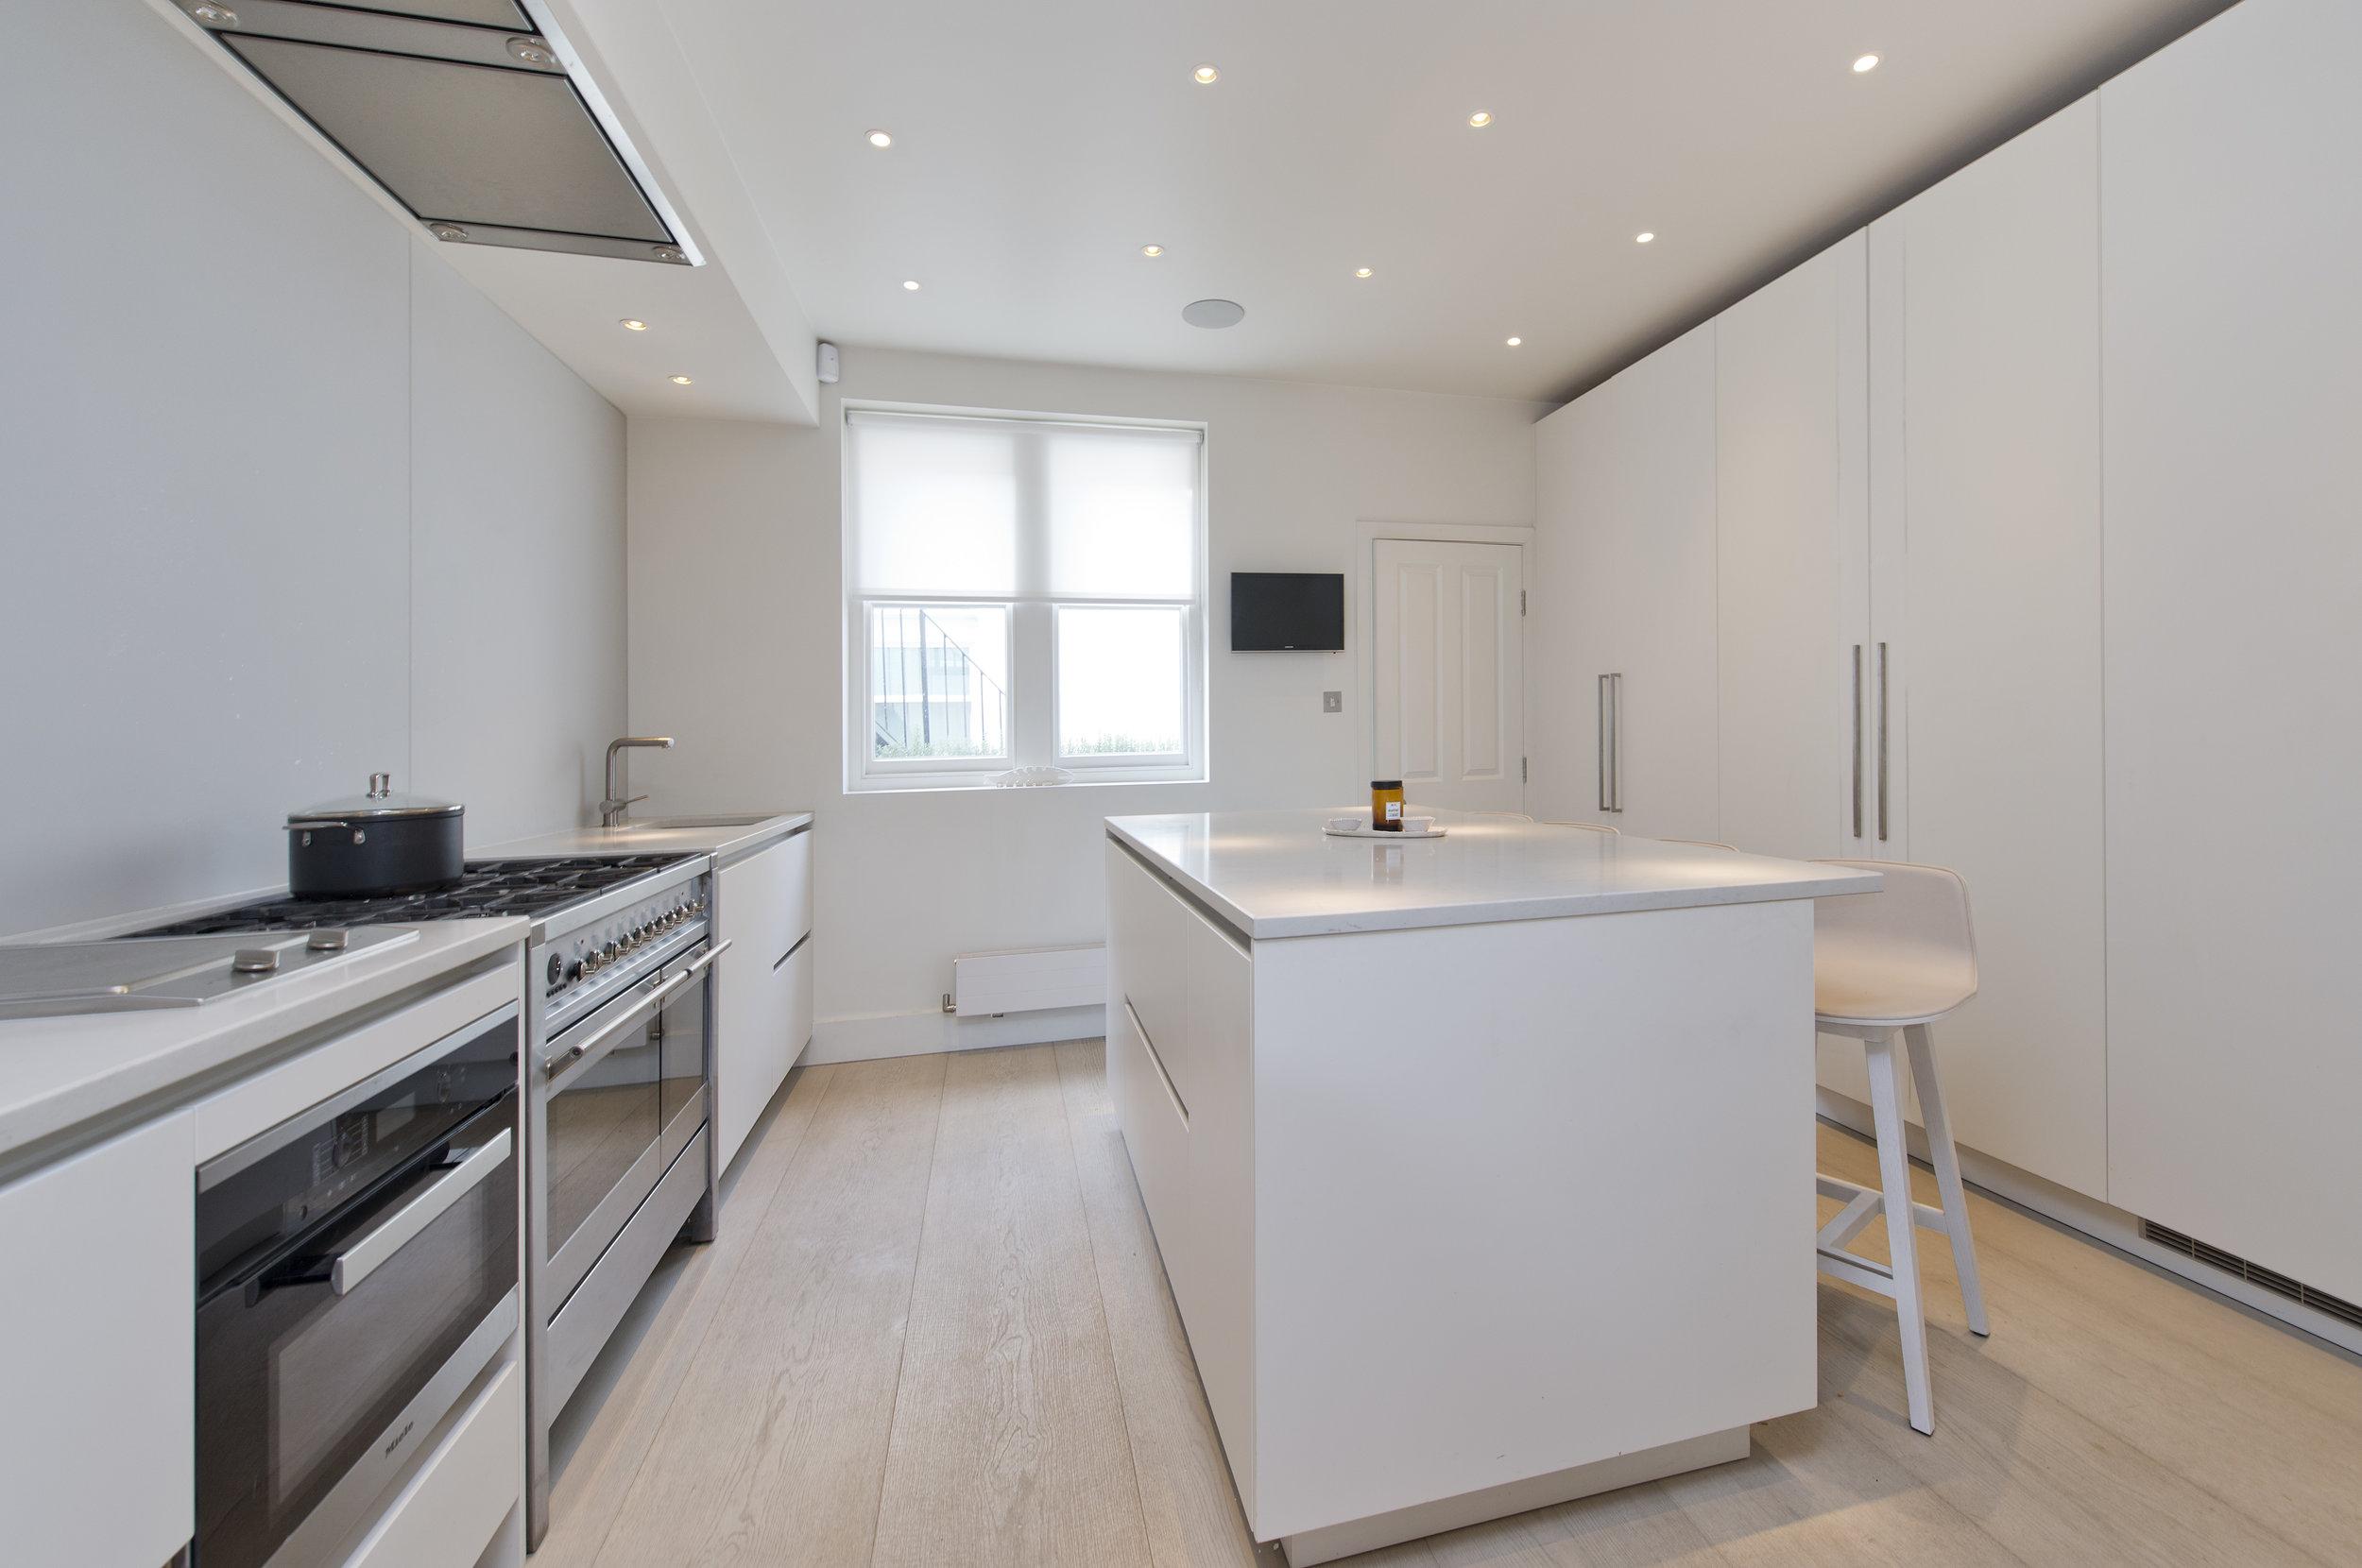 Bespoke Kitchen, Chelsea, The Kitchen and Loft Company.